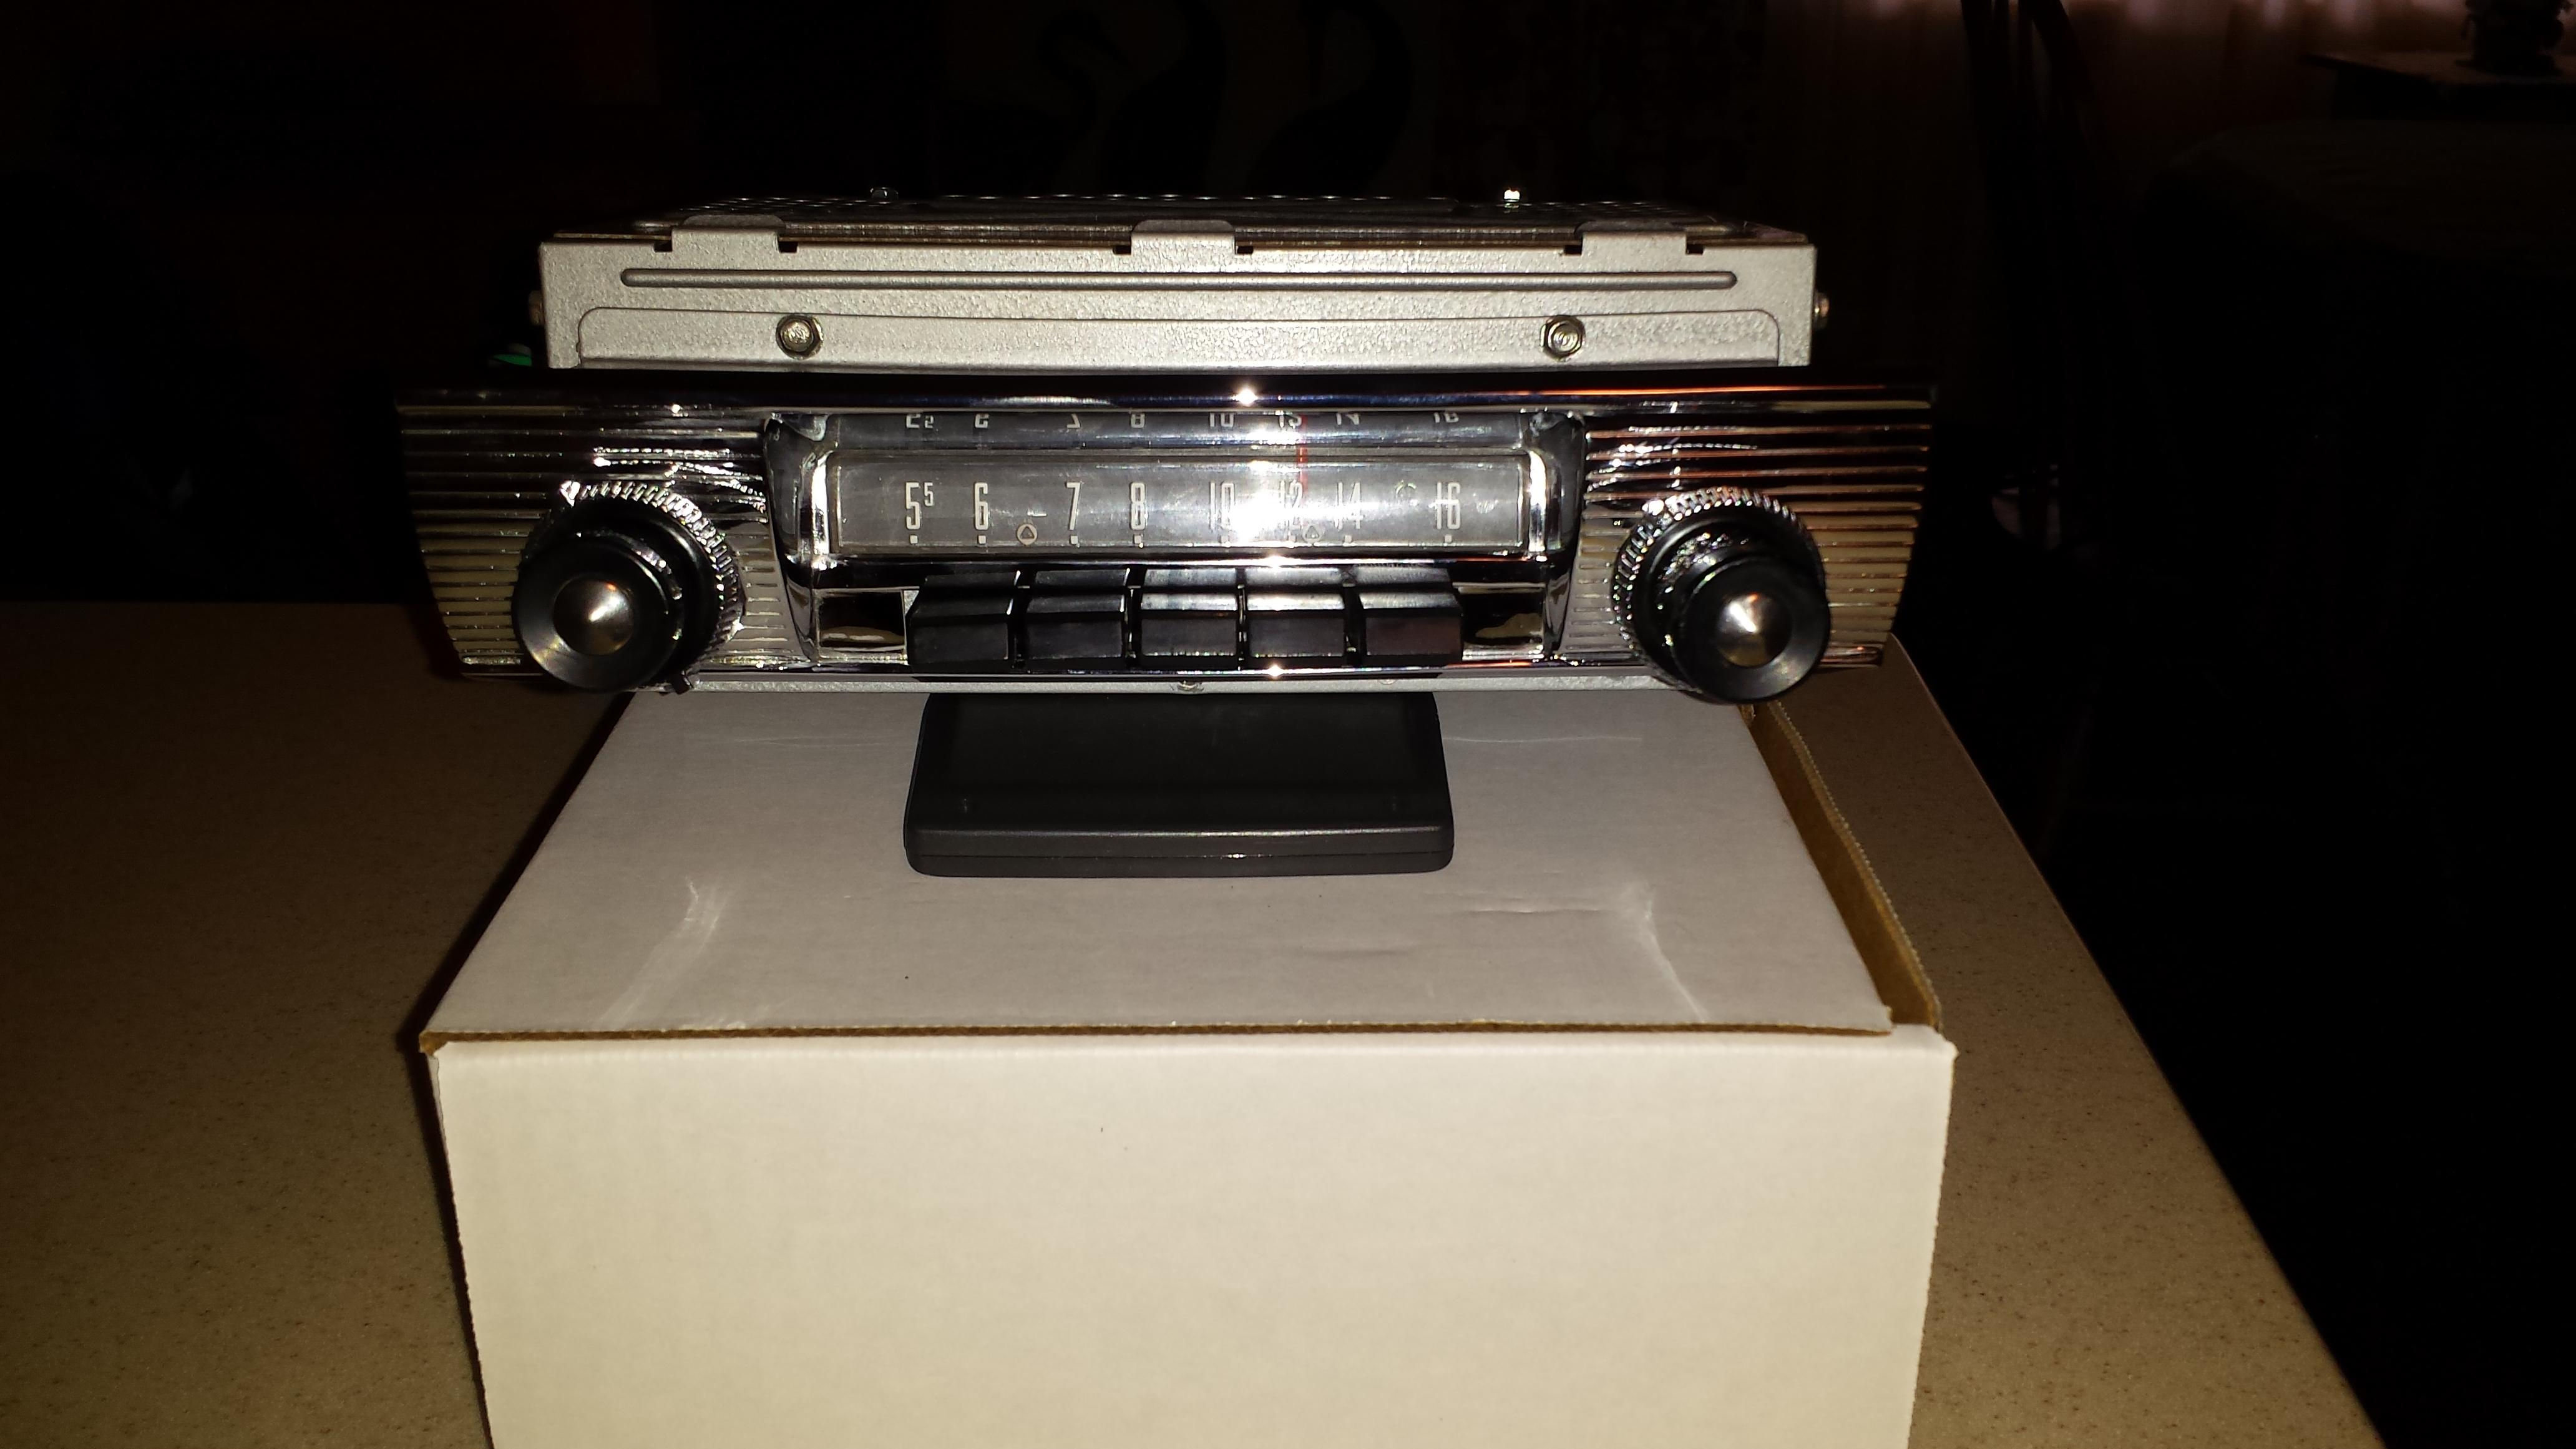 1956 FORD PUSHBUTTON RADIO